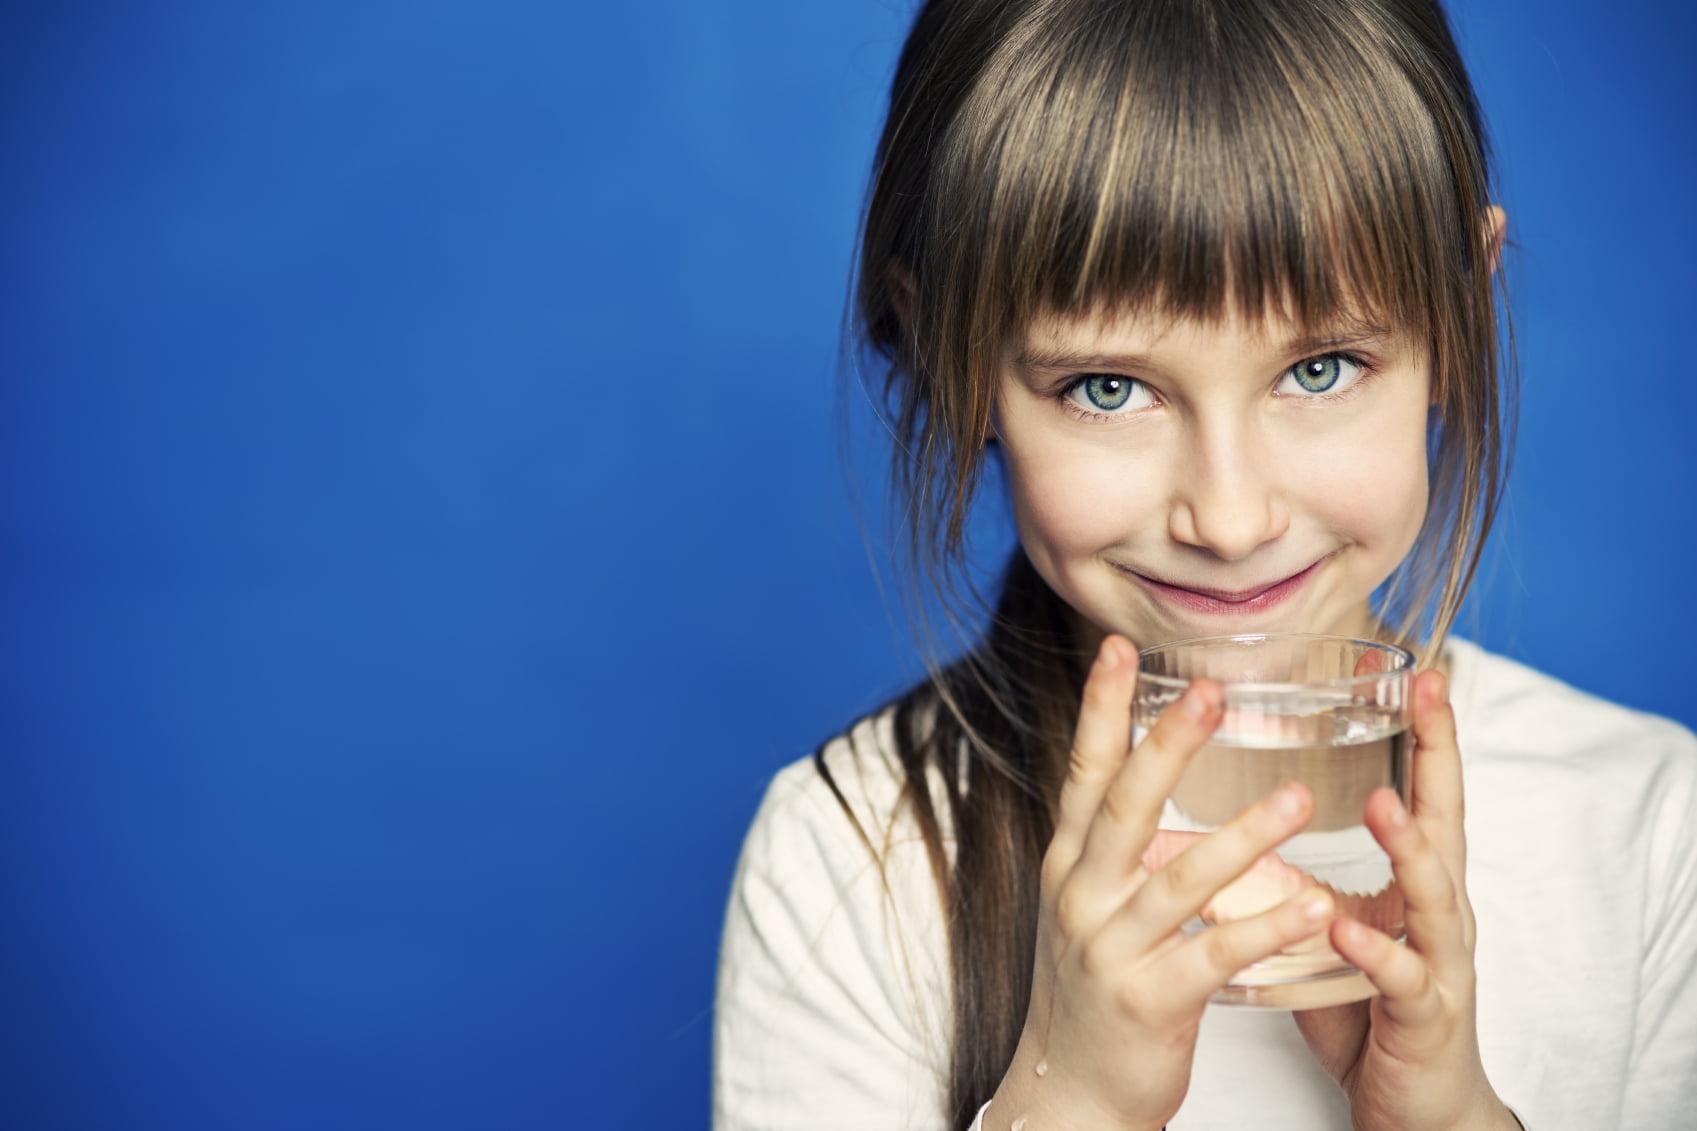 bevande_bambini_acqua_bambini